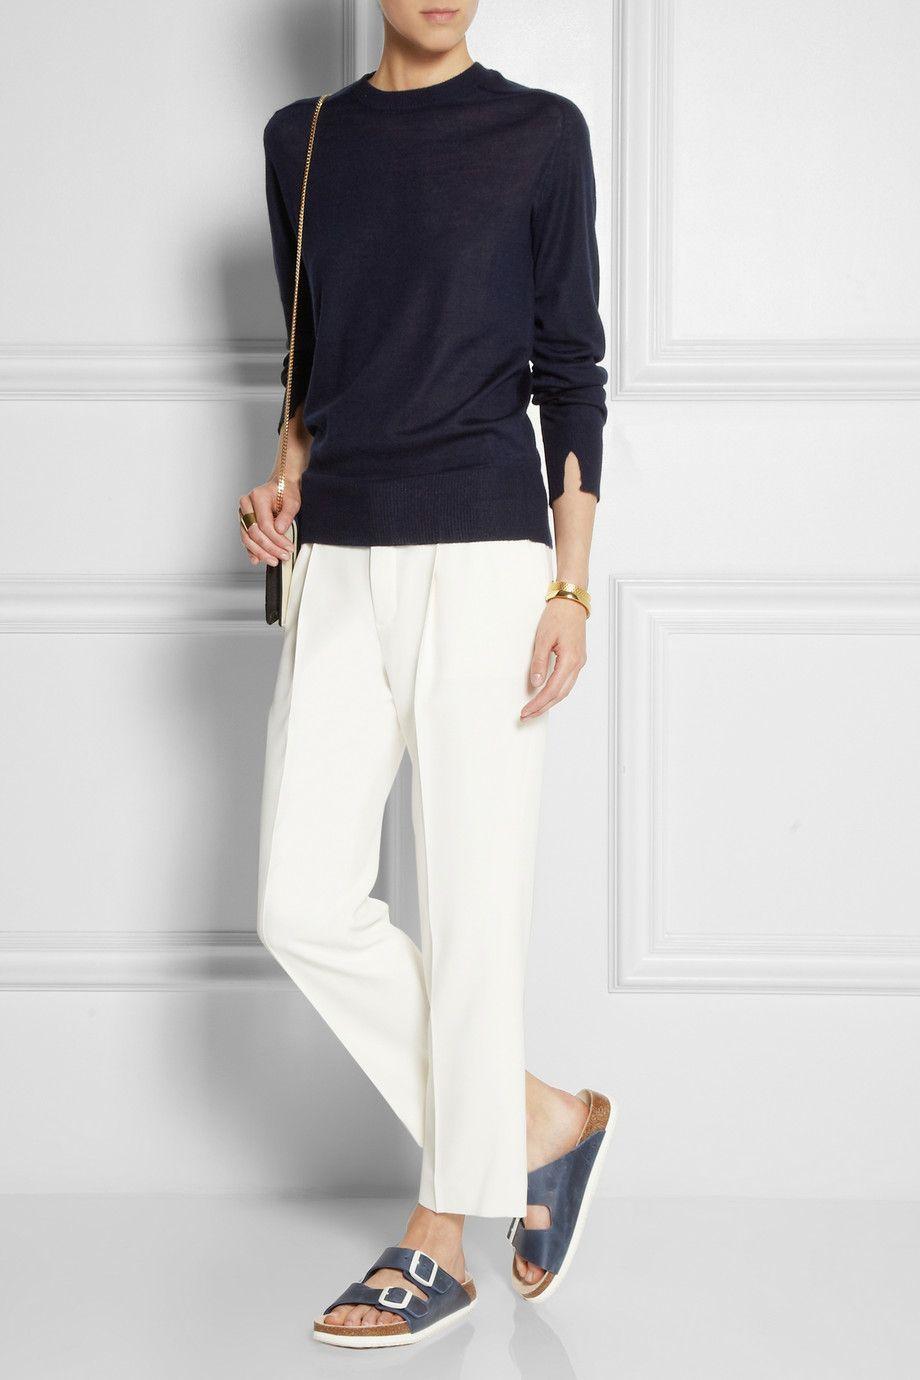 detailed look 87291 715e2 Toteme | Verona cashmere sweater | NET-A-PORTER.COM | Things ...